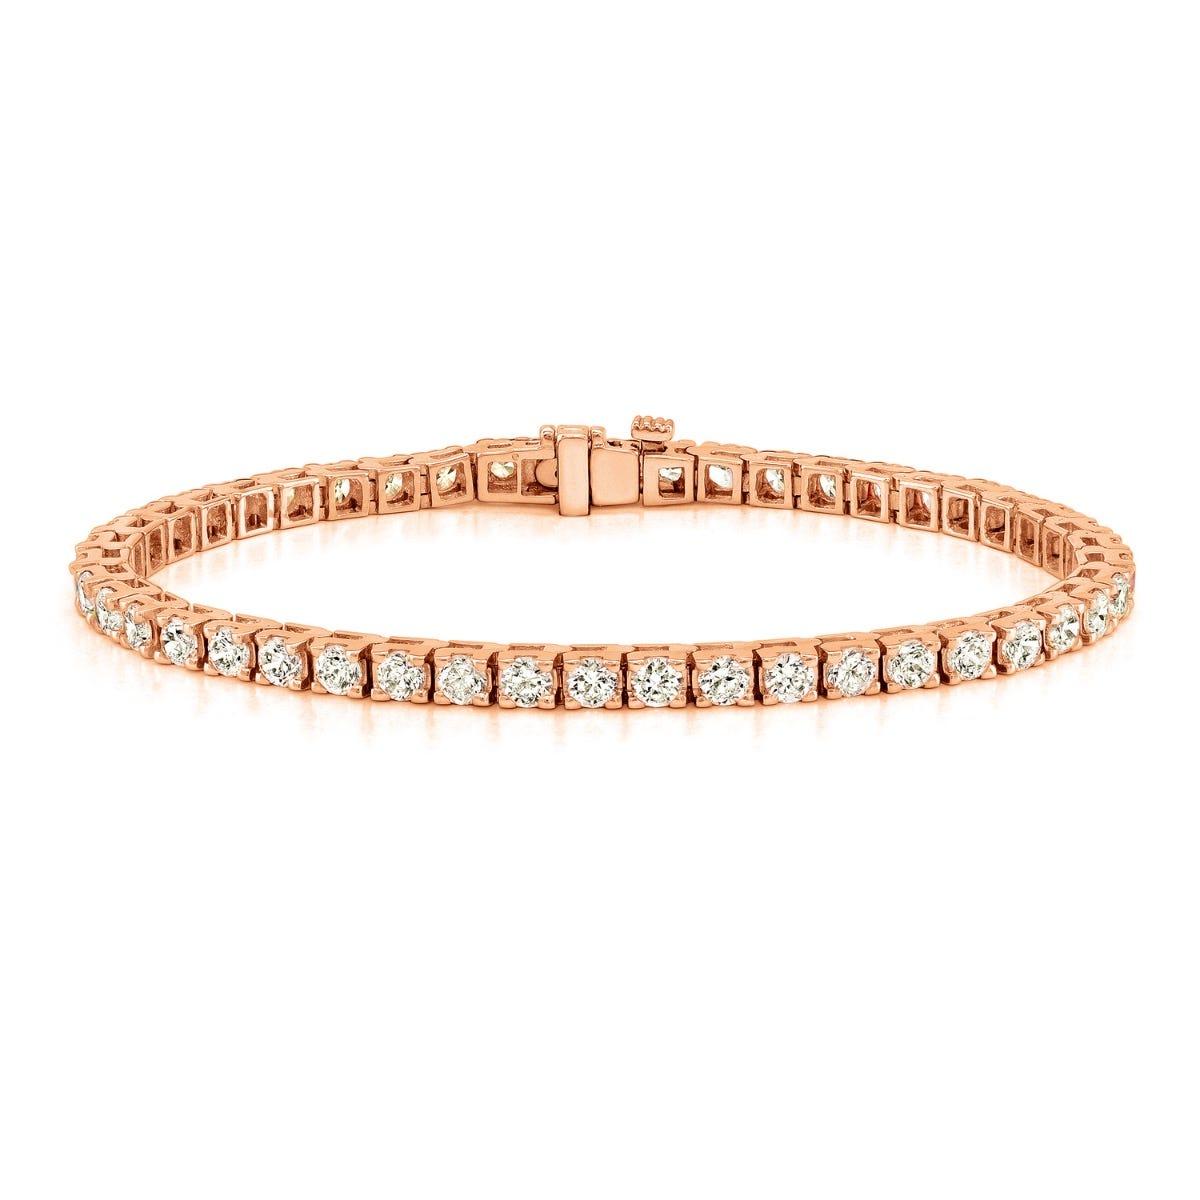 6ctw. 4-Prong Square Link Diamond Tennis Bracelet in 14K Rose Gold  (IJ, I1-I2)